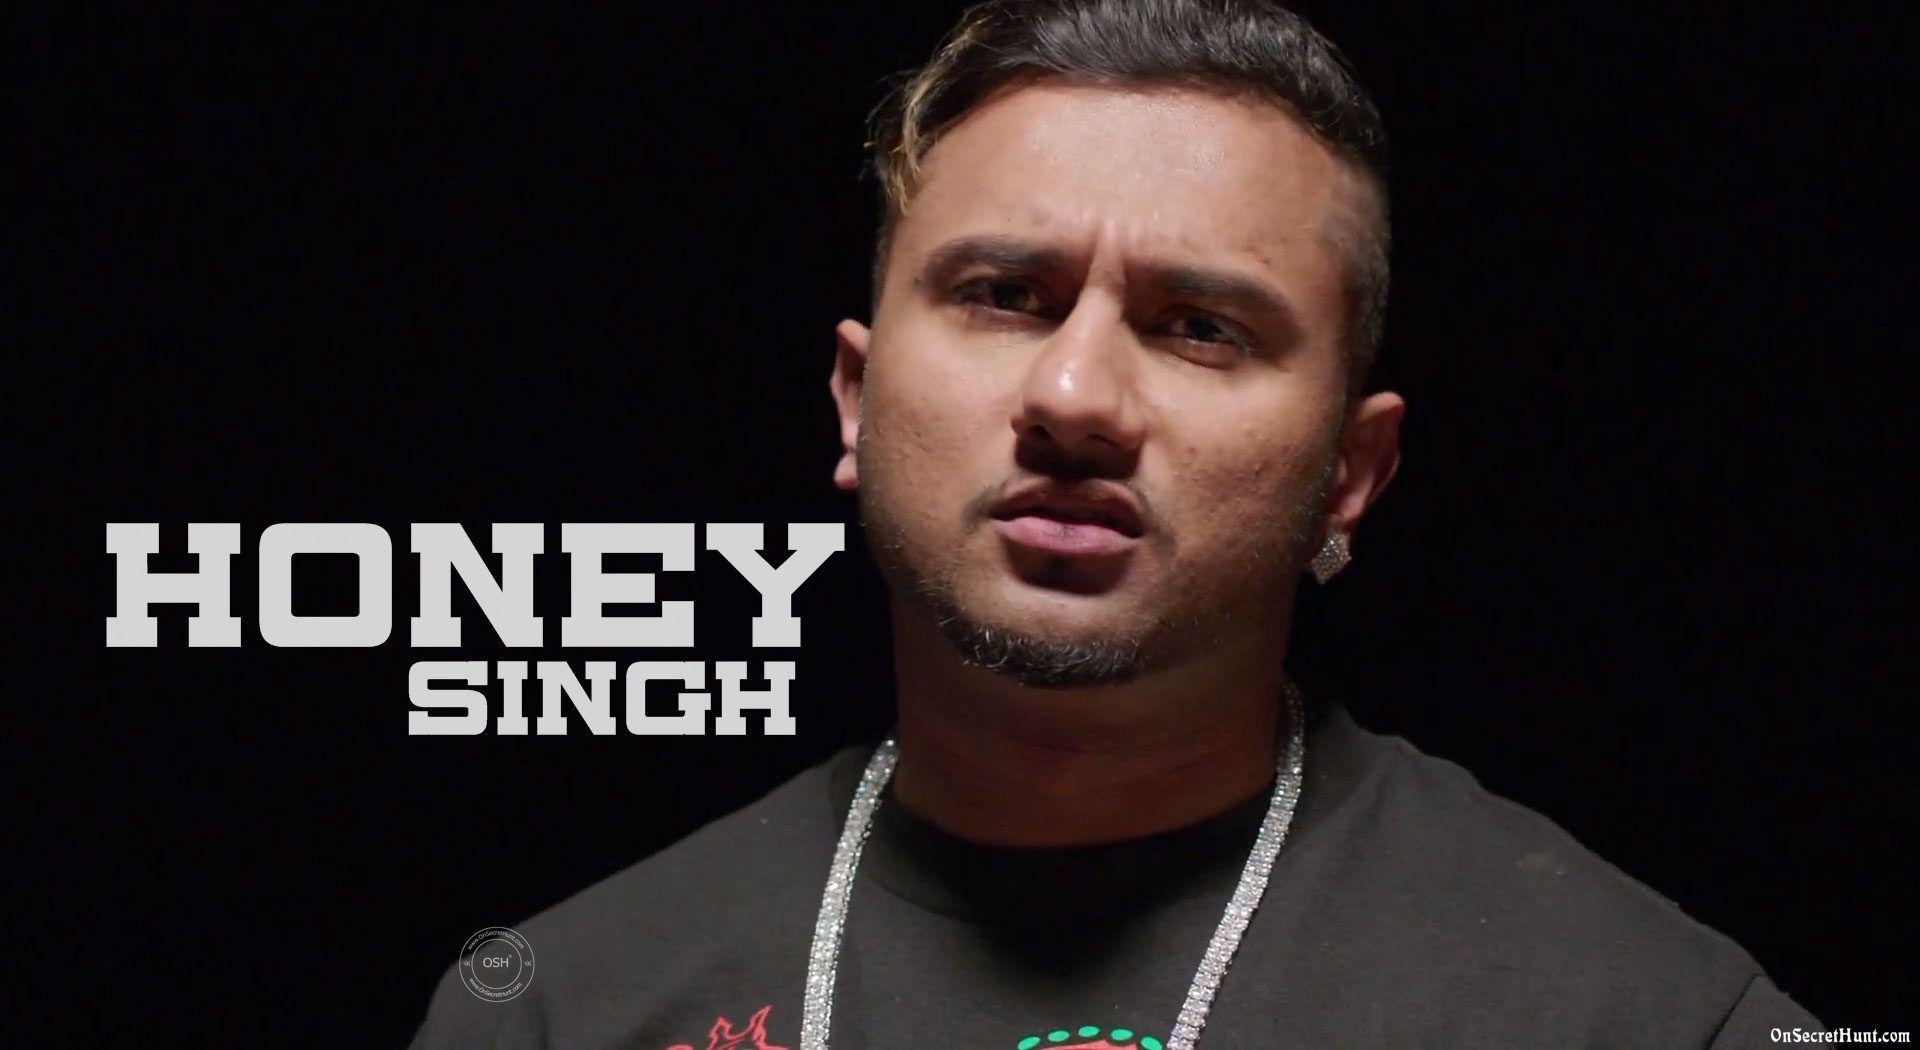 Honey Singh Wikipedia: Pin By DOPE285 Rana On ☆ YO YO HONEY SINGH LOVERS ☆